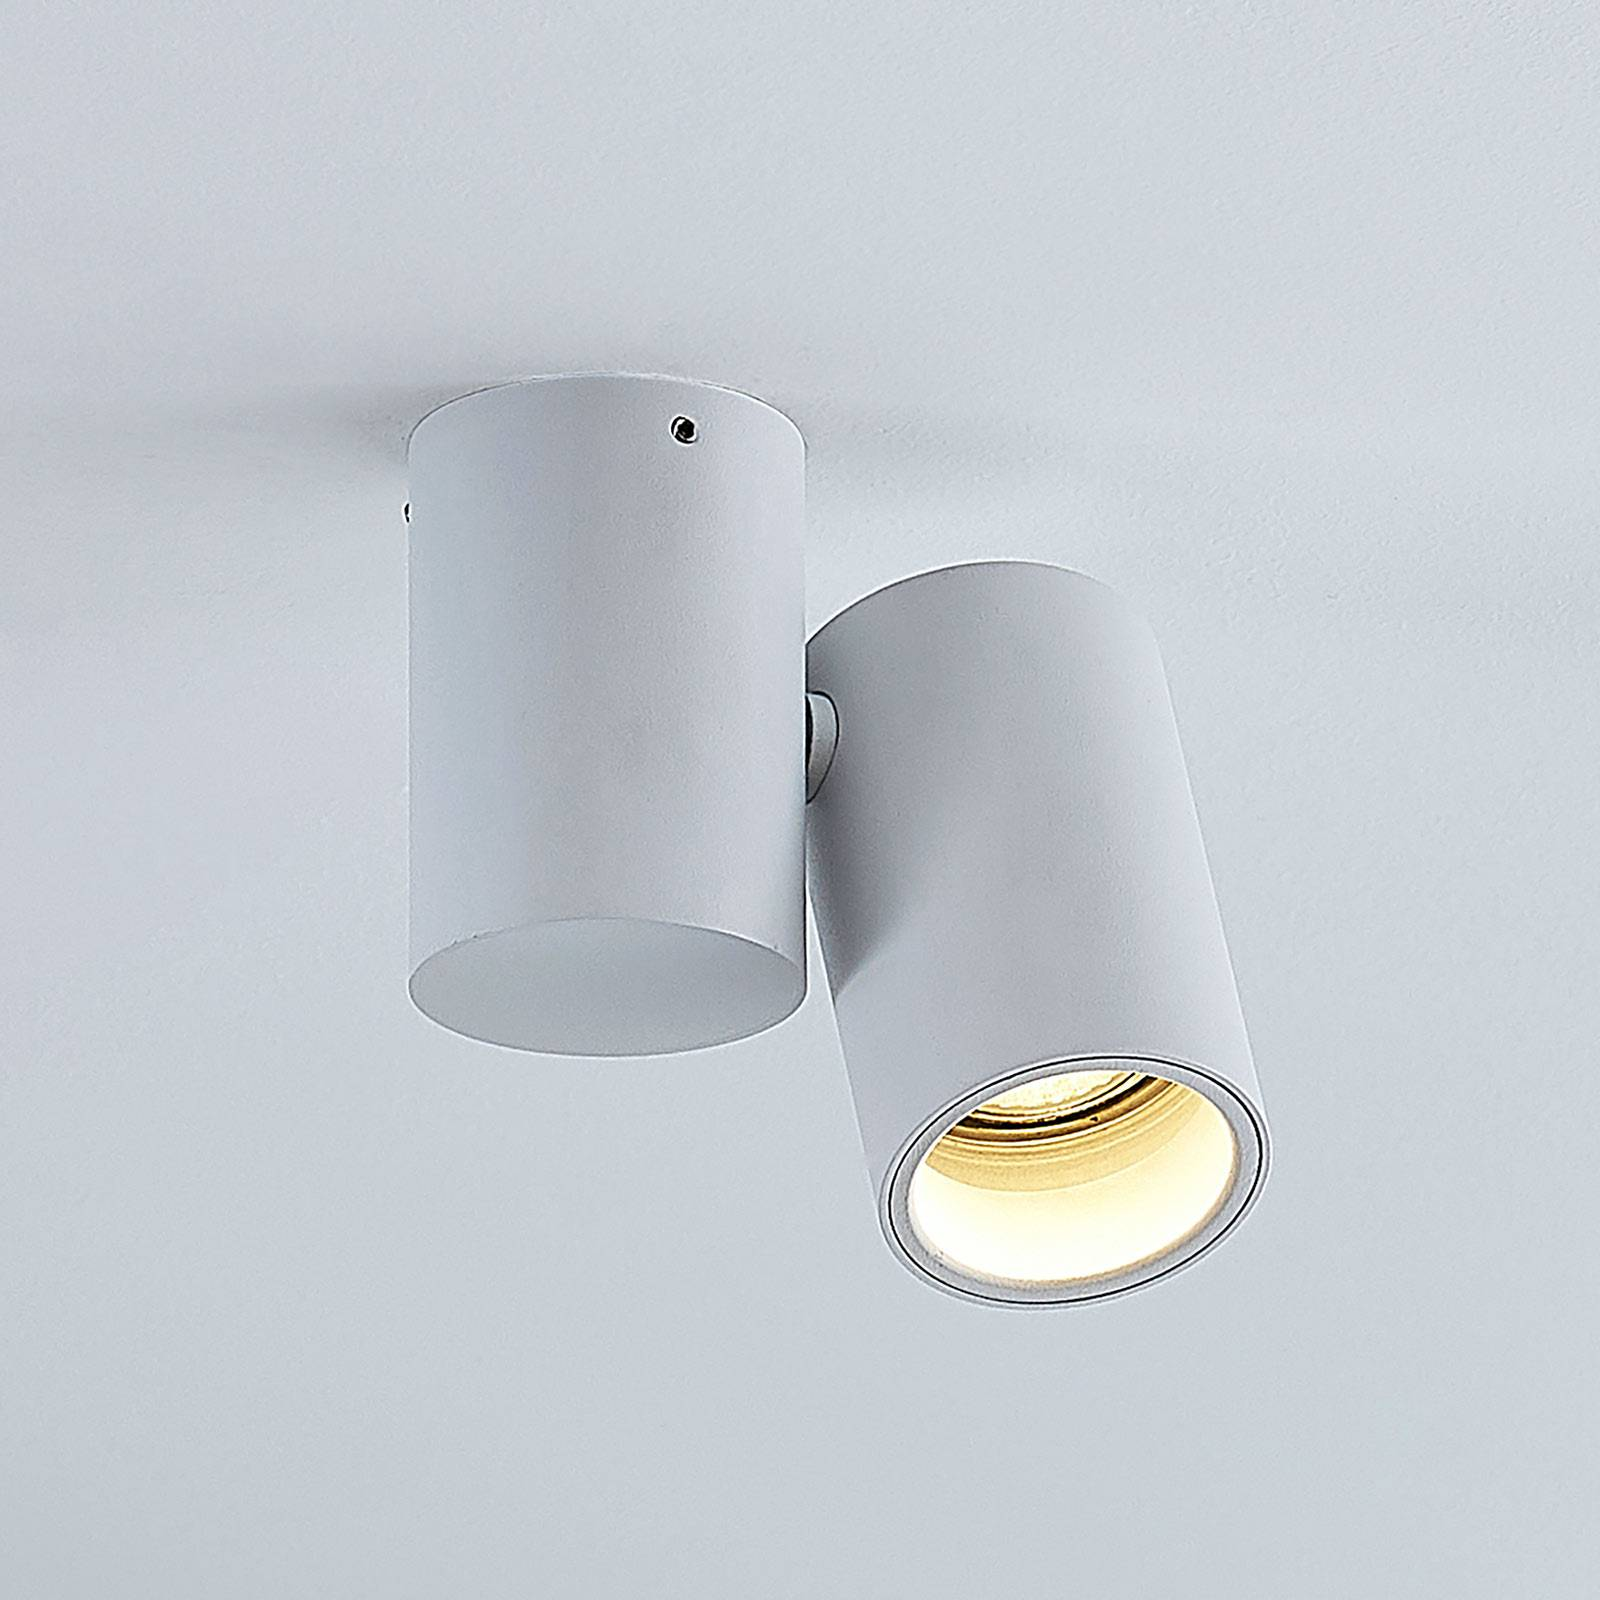 Lampa sufitowa Gesina, 1-punktowa, biała